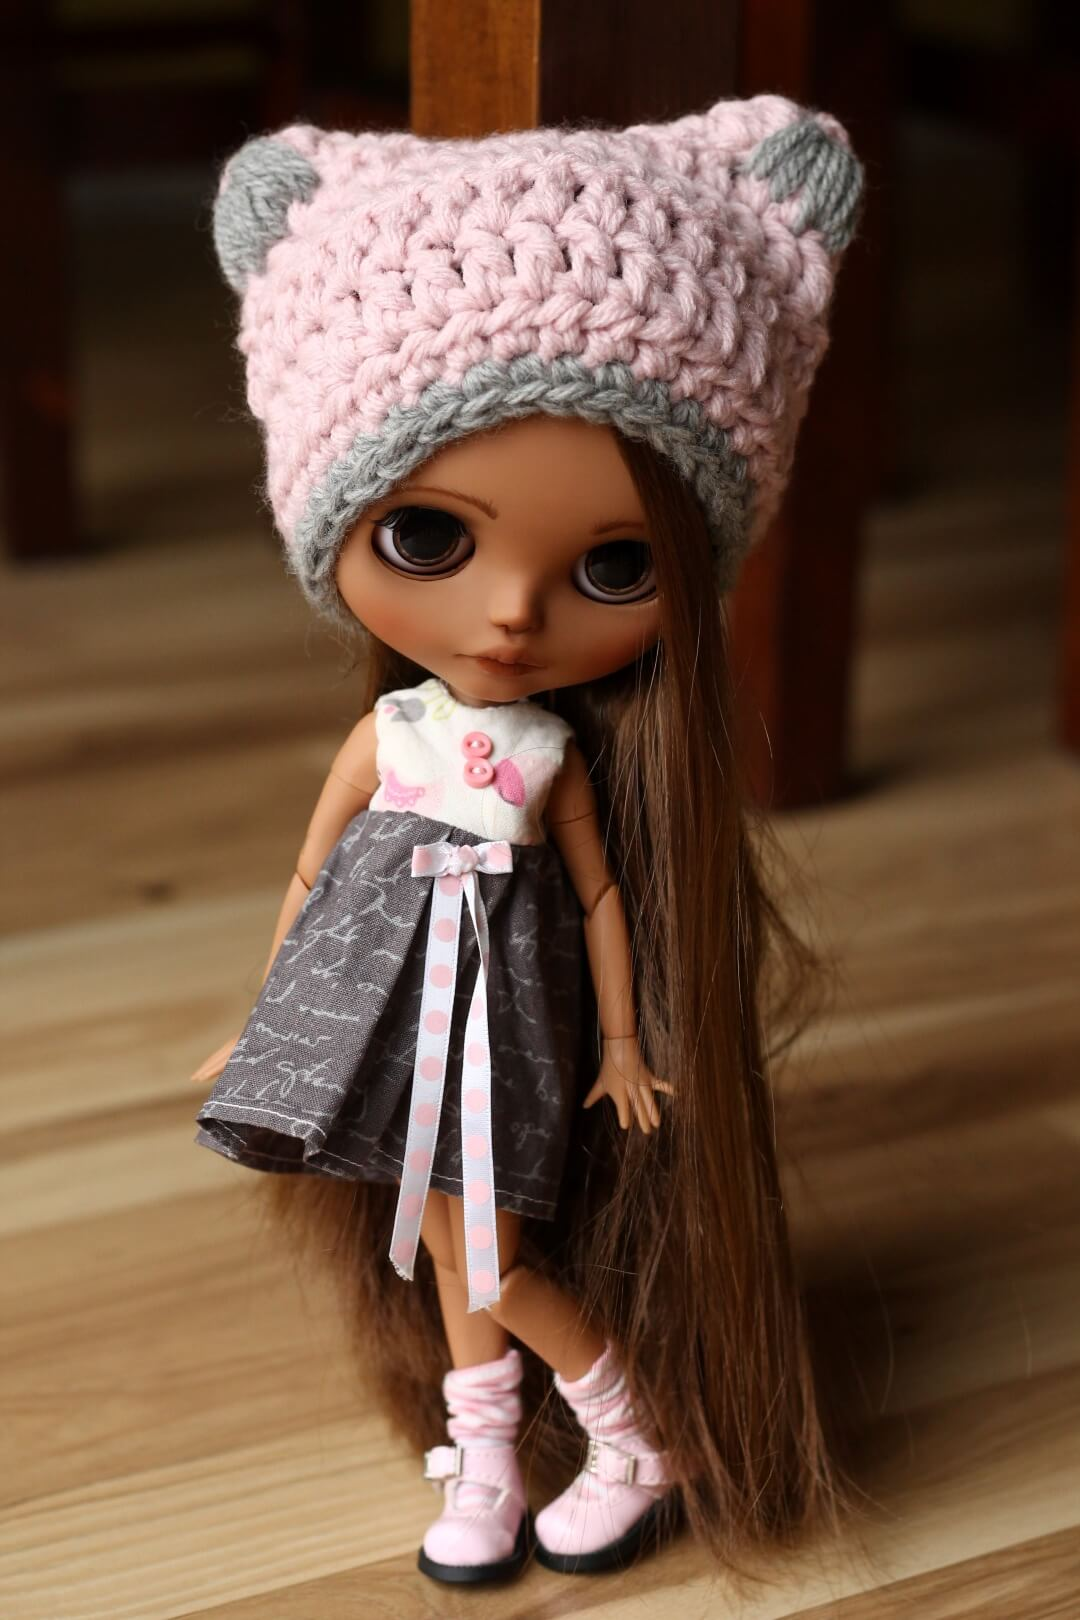 Custom Blythe Doll no 43 Hattie - 14